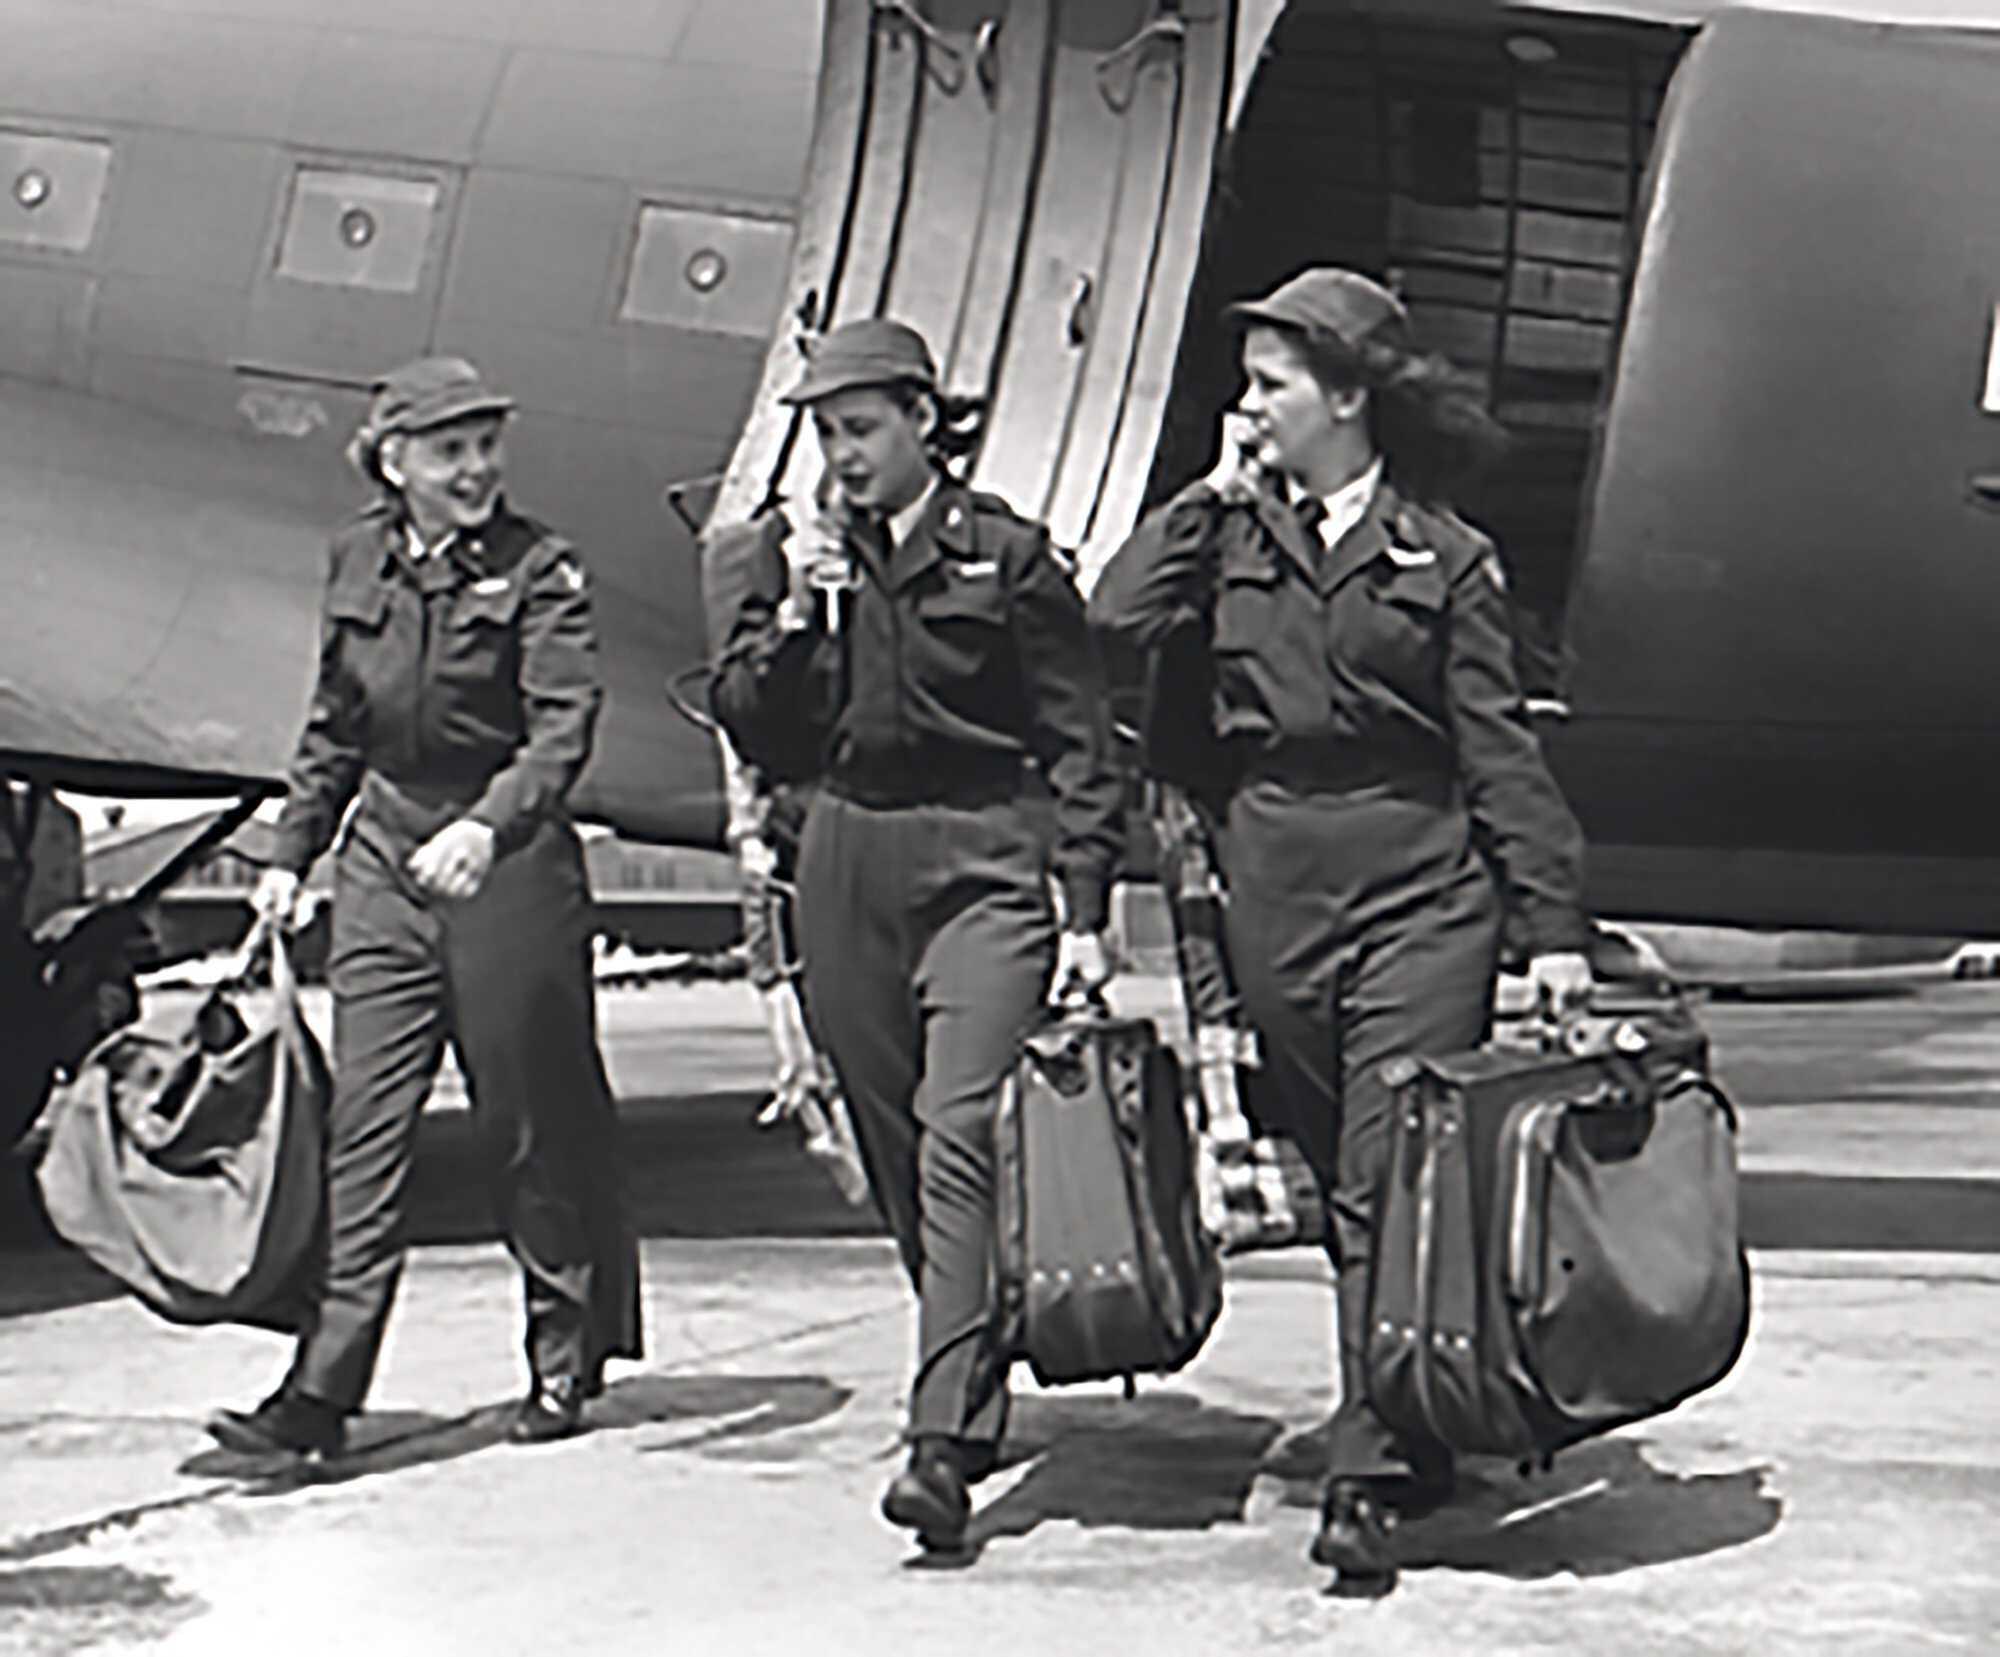 flygirls_establishment-wasps-dec-20-1944.jpg